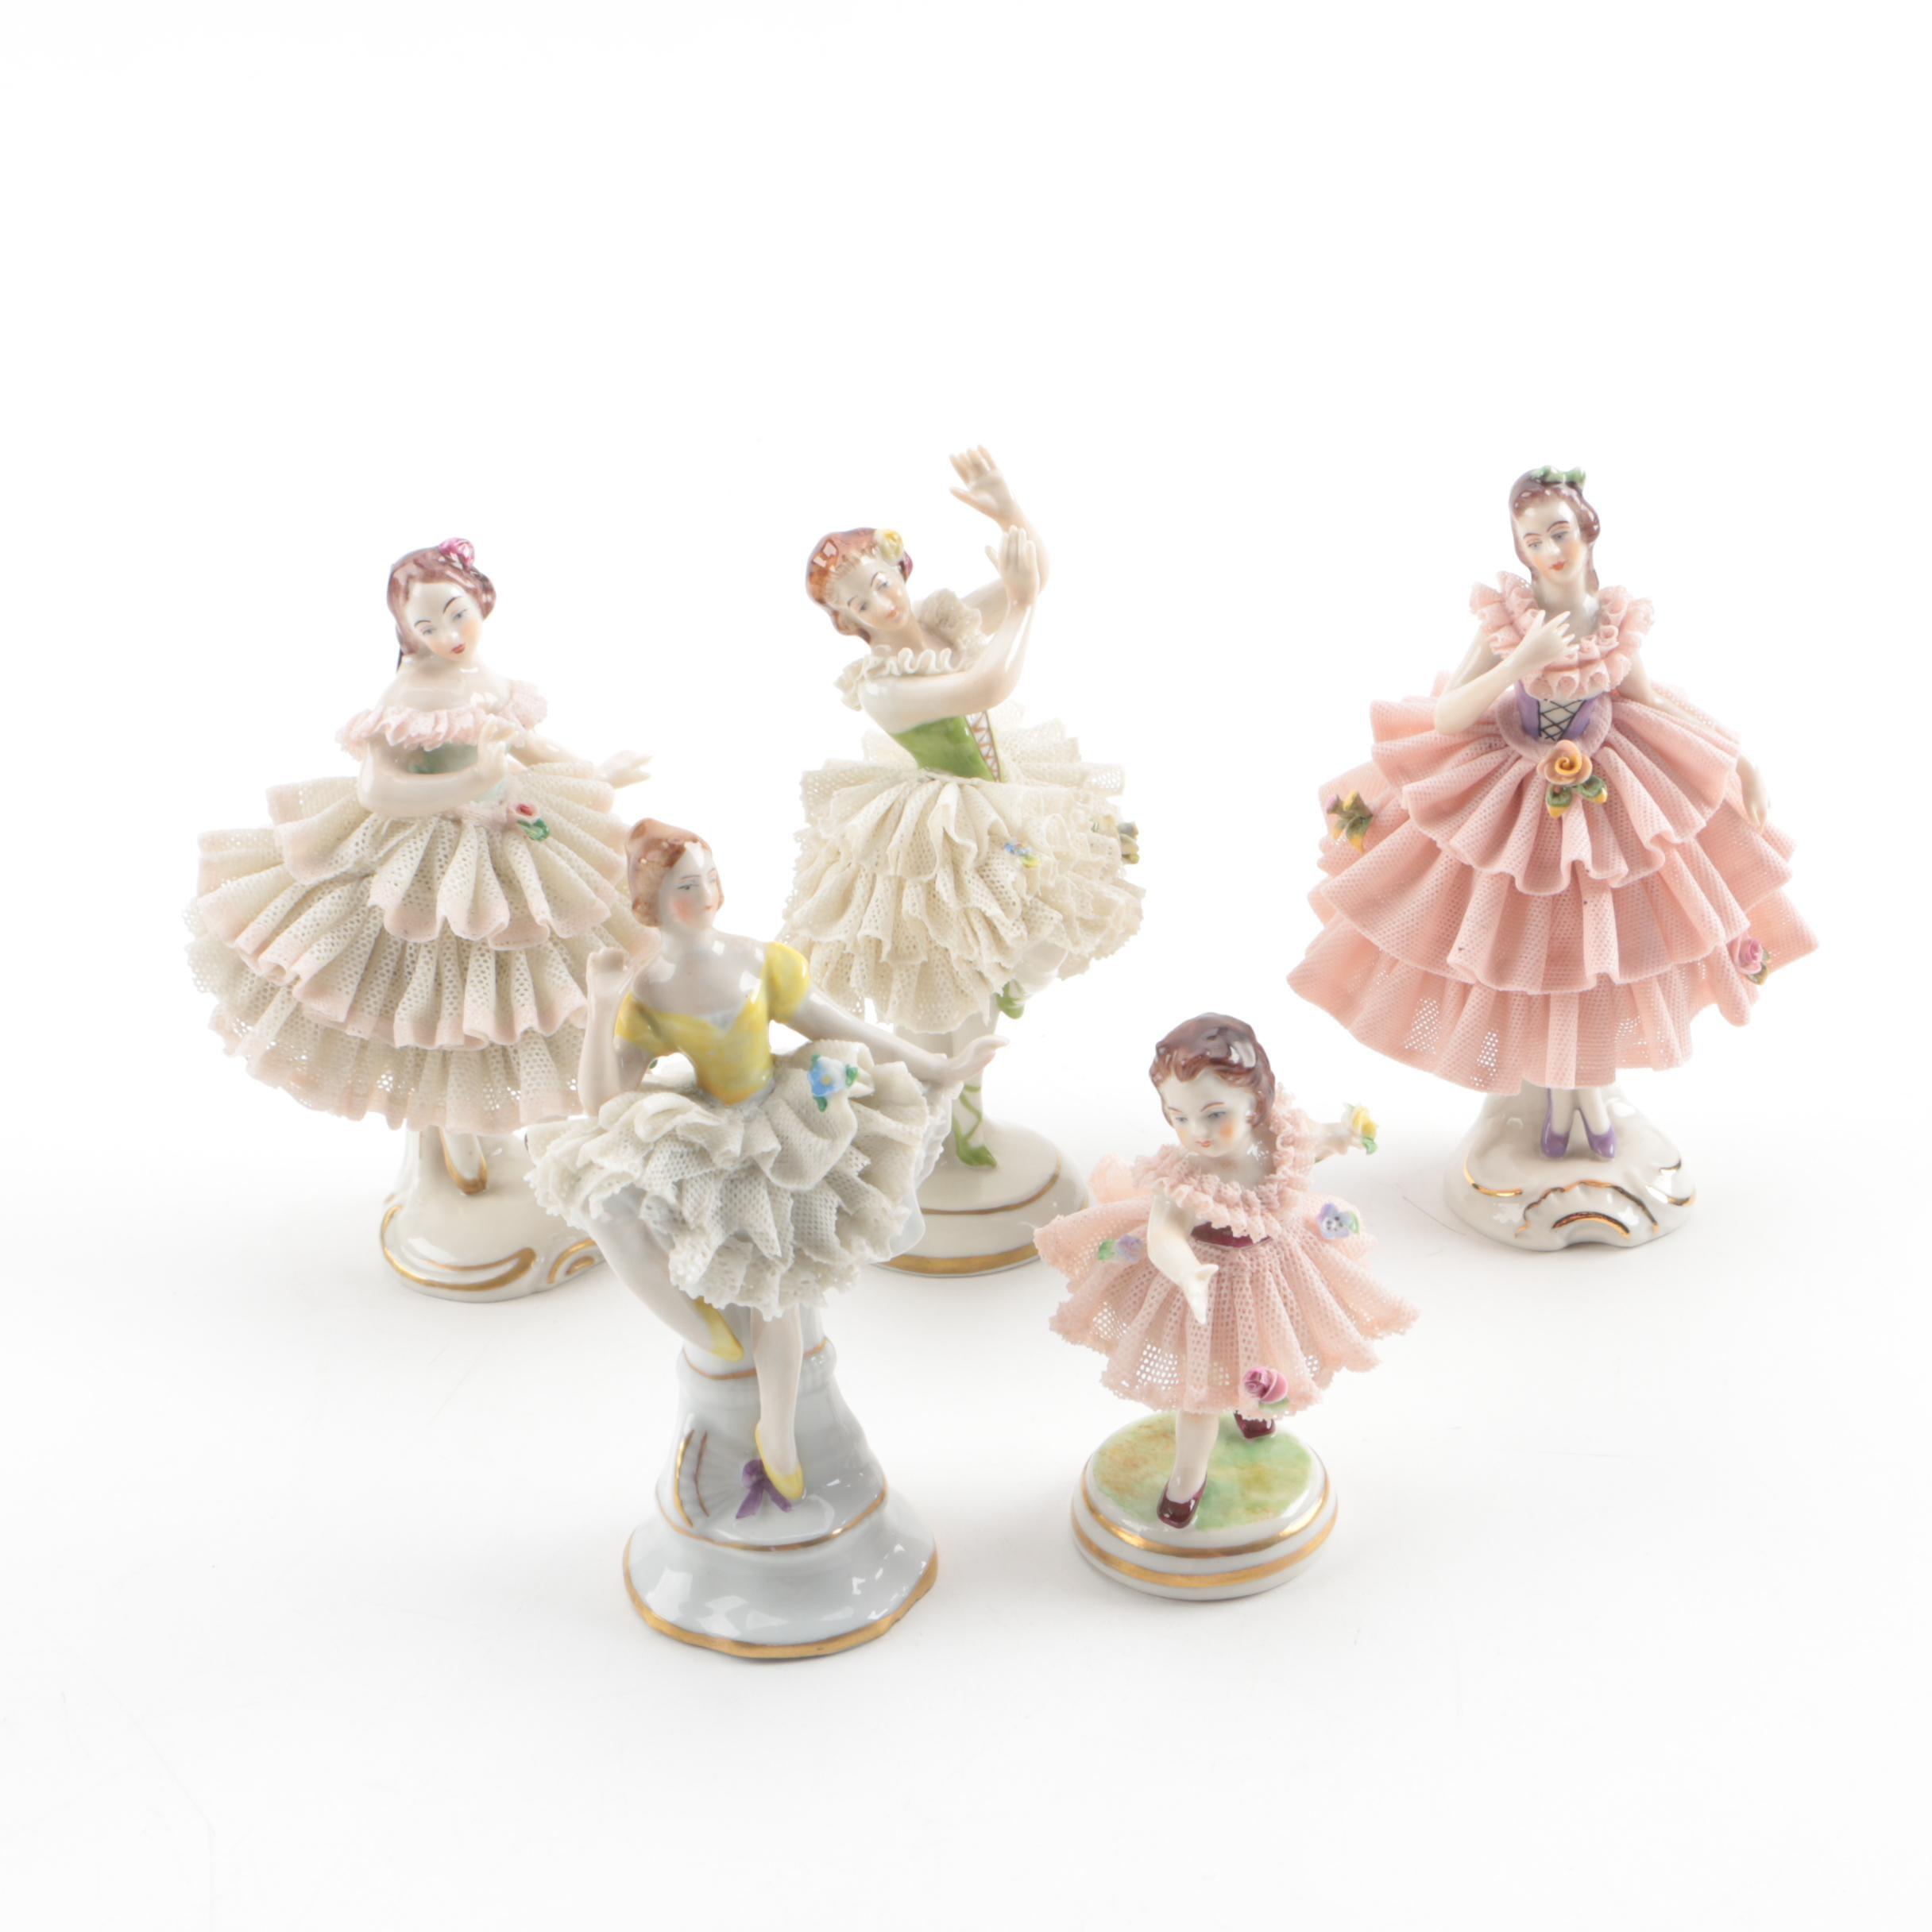 Dresden Lace Porcelain Lace Ballerina Figurines Including Aelteste Volkstedter